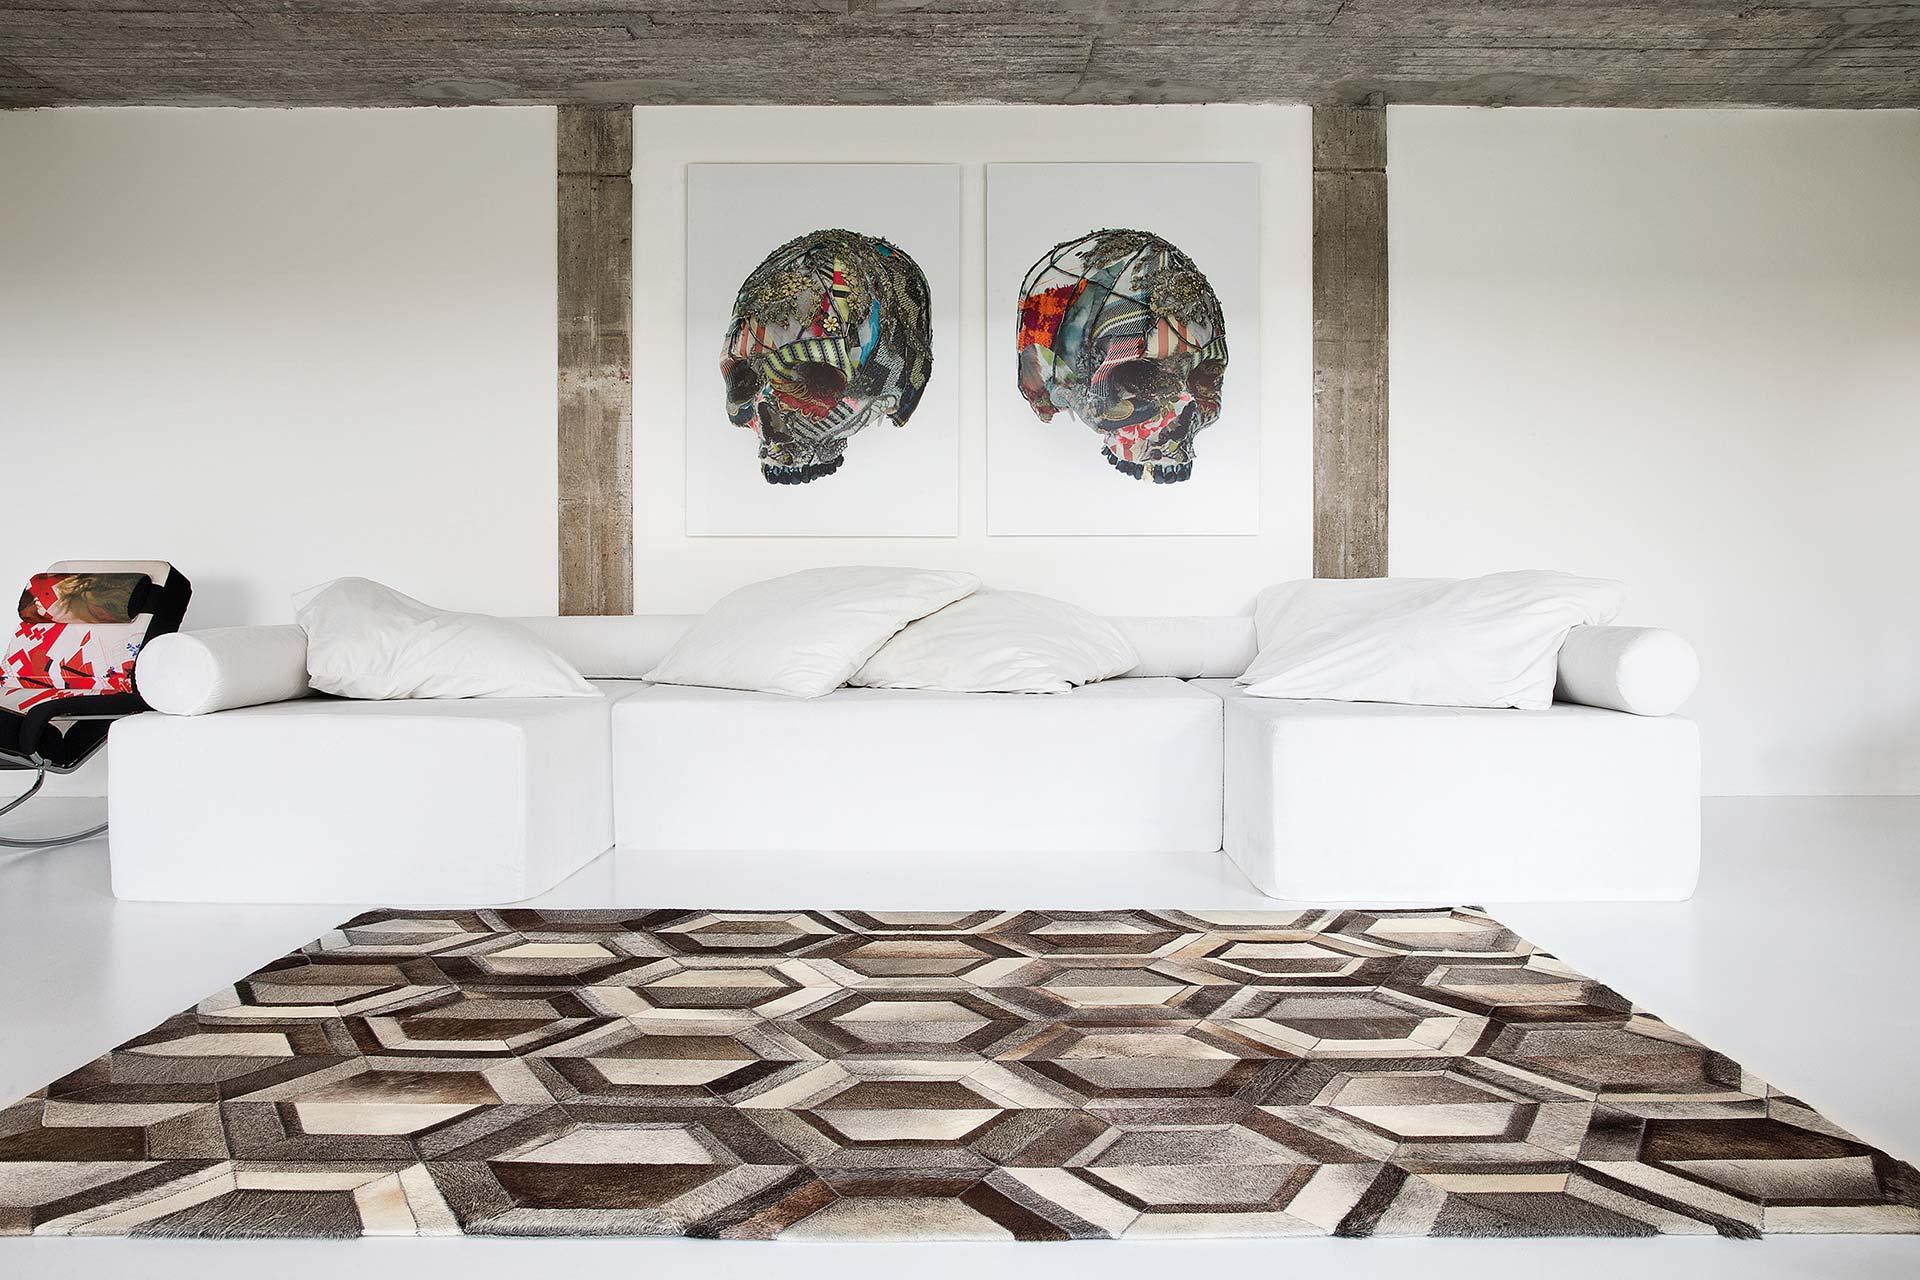 greystone-grey_sfeerbeeld_Limited-Edition_carpets.jpg